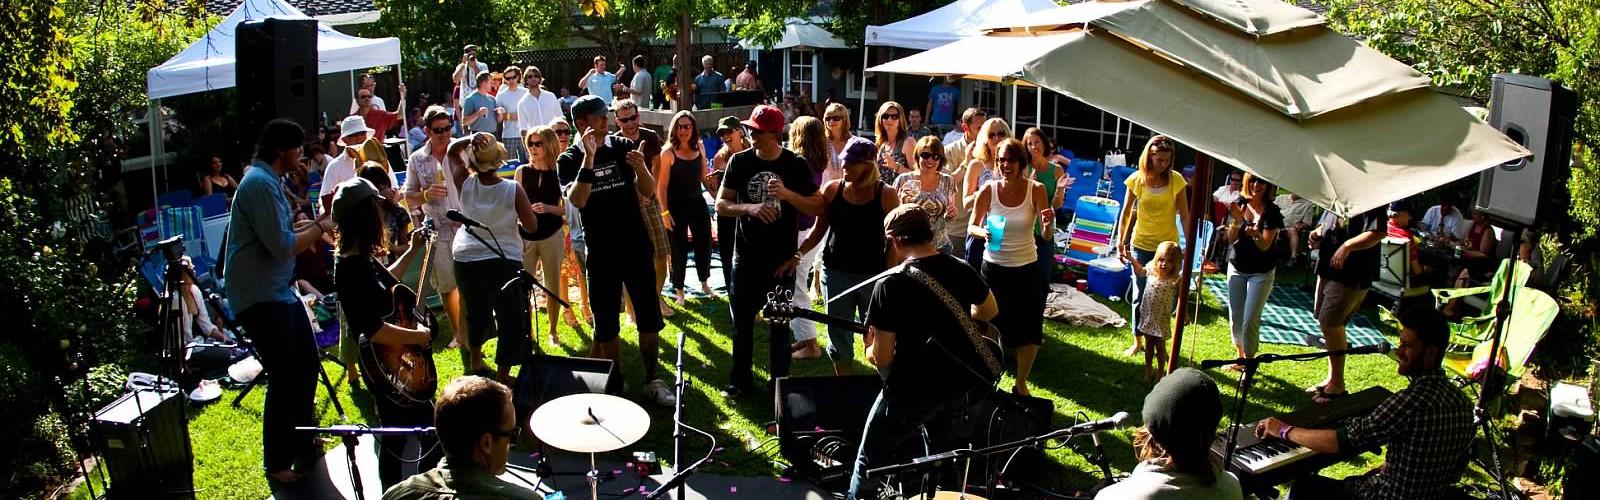 bertani backyard benefit concert